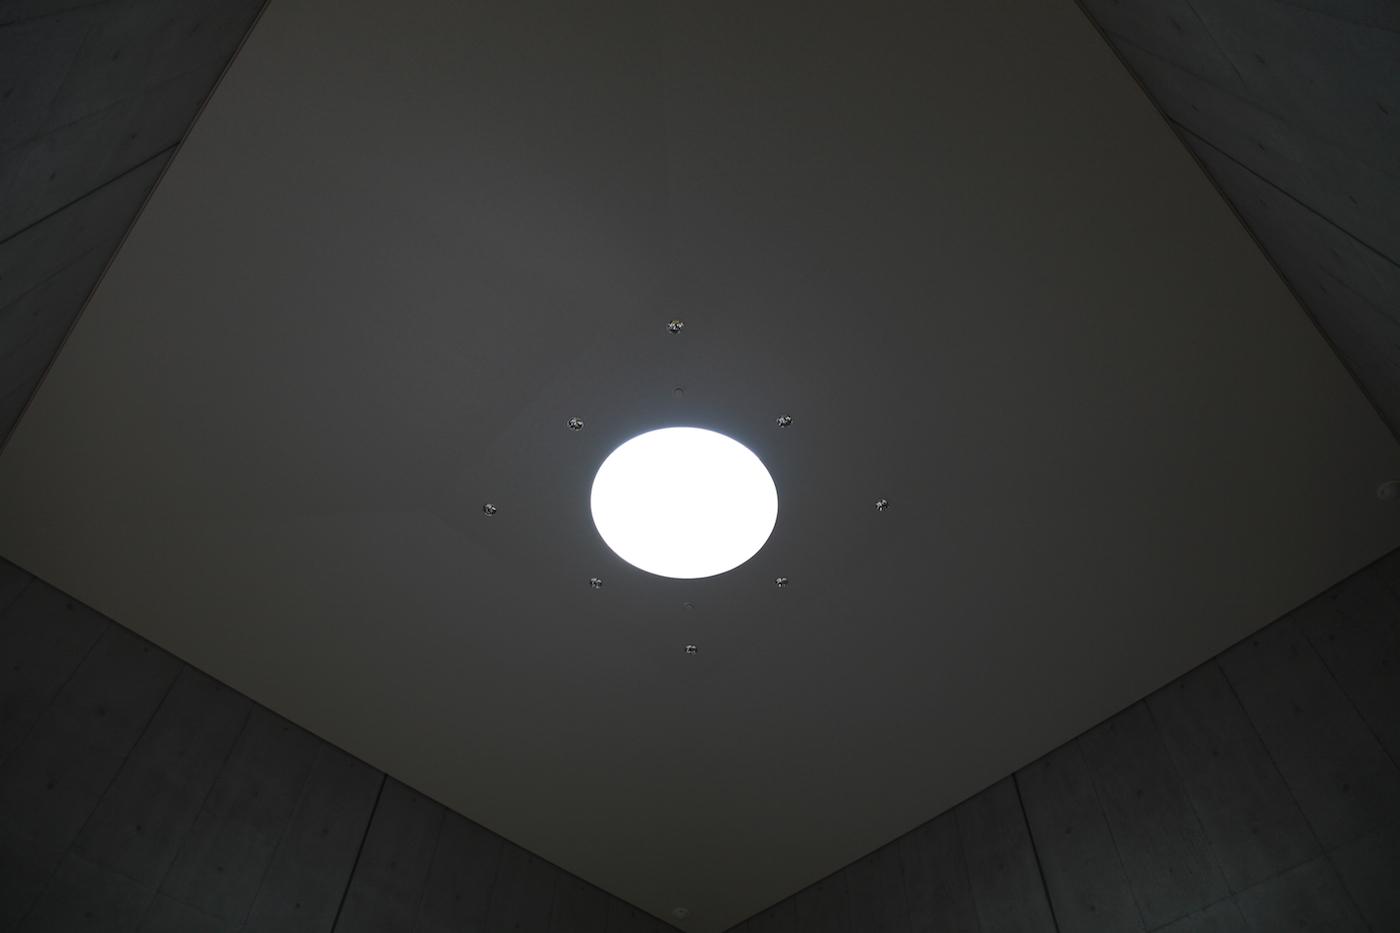 2015 04 05 12